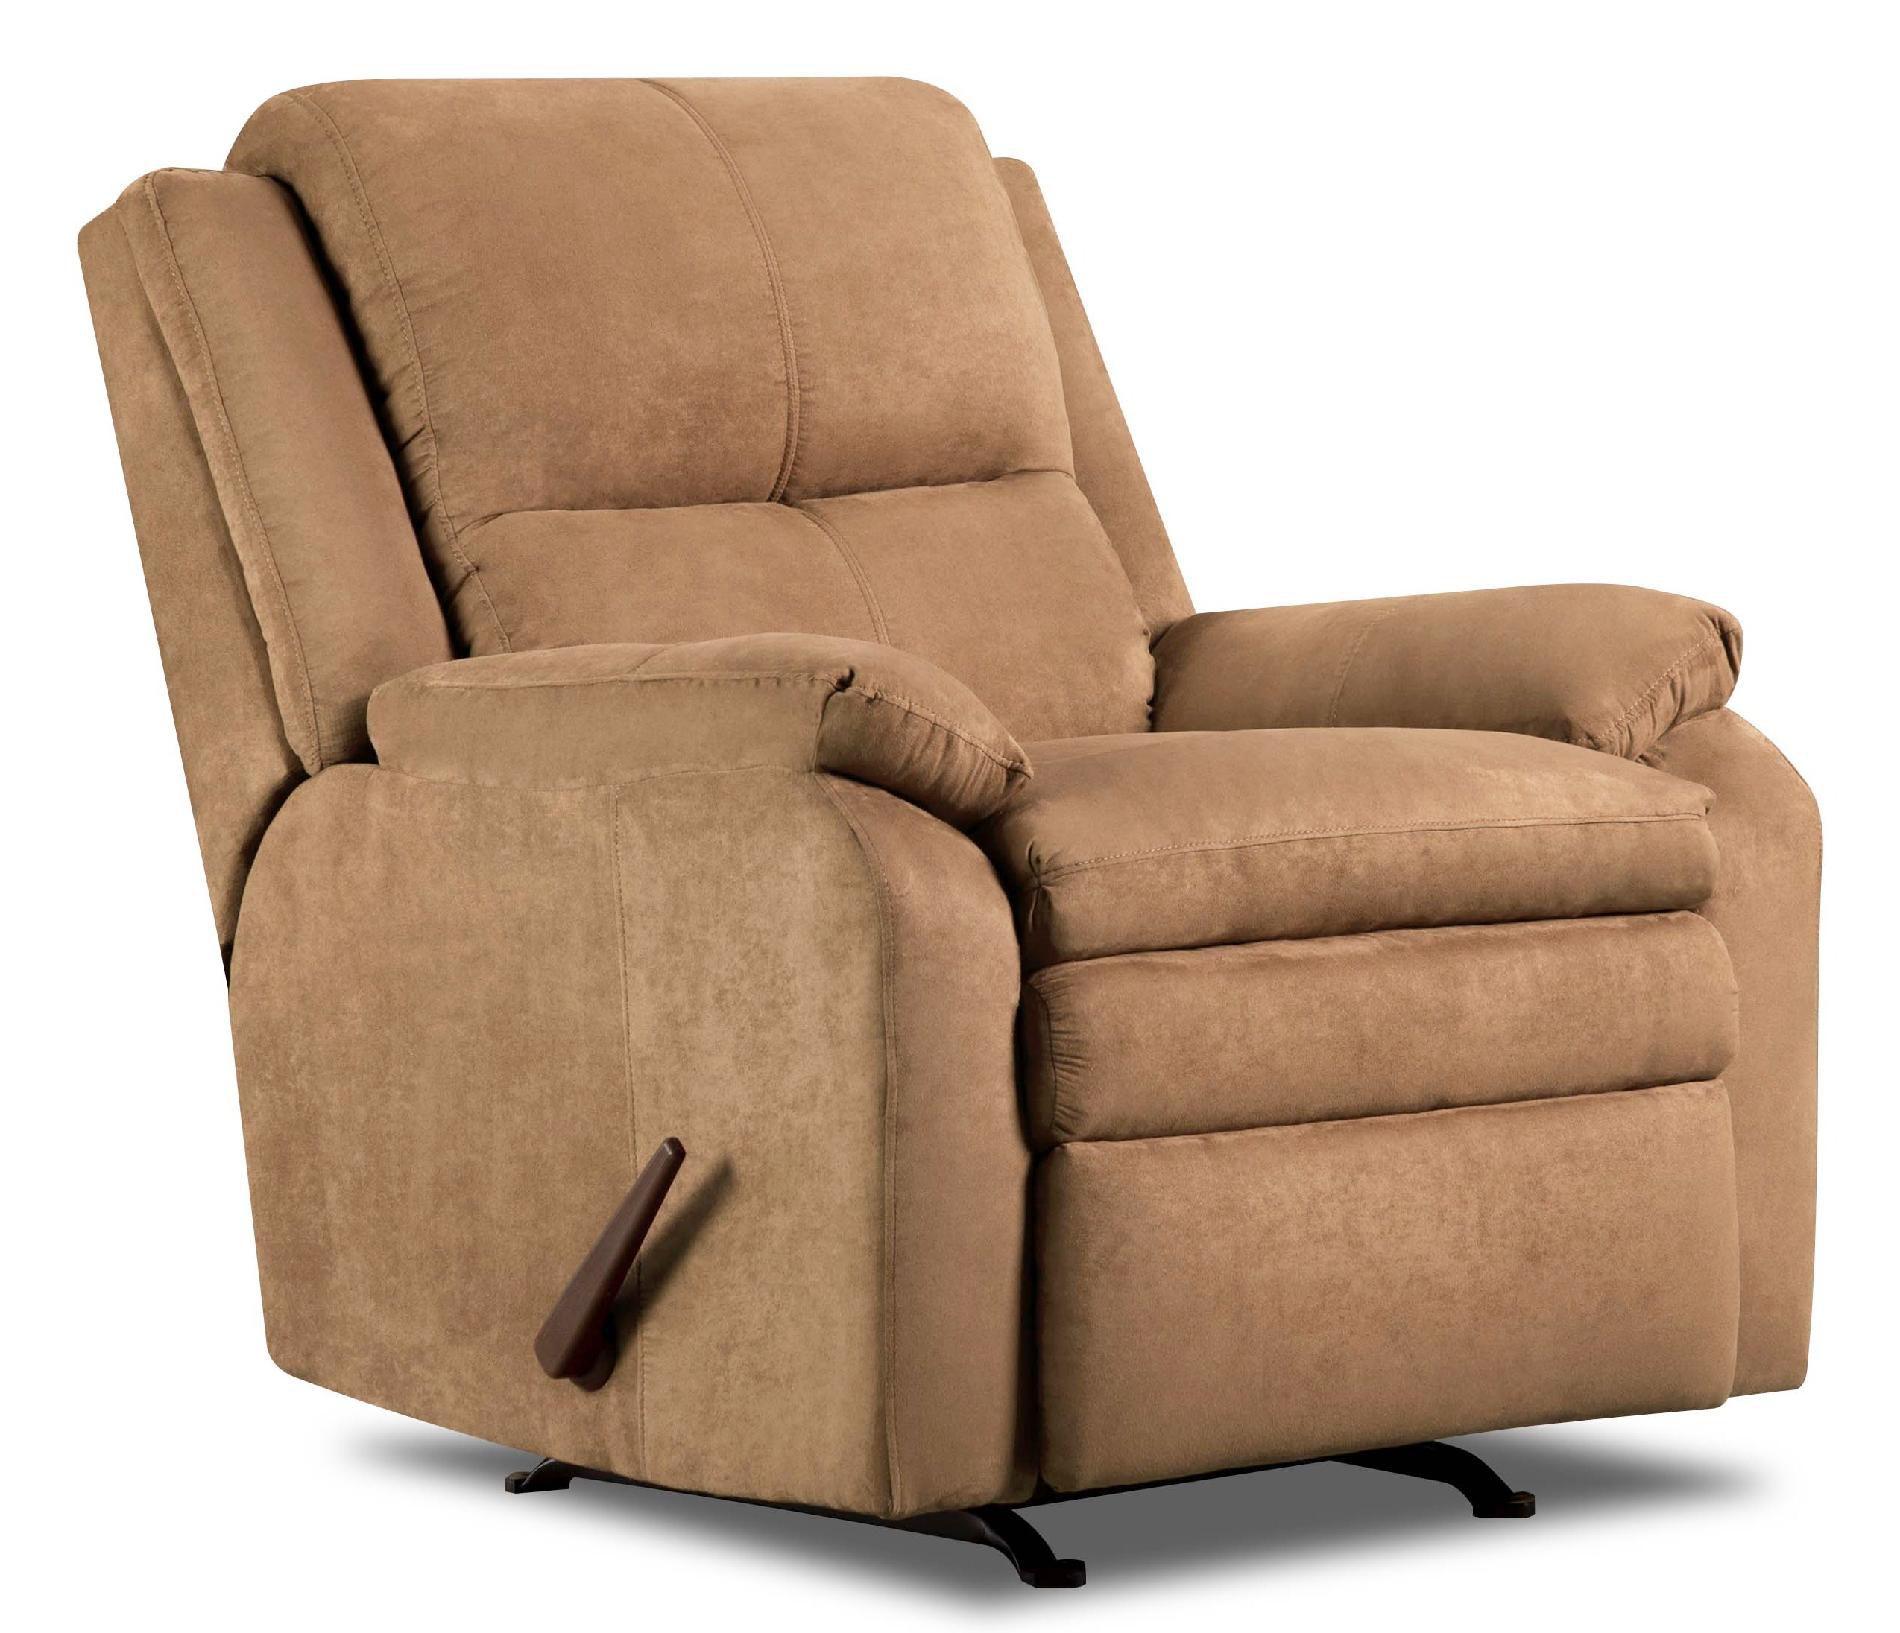 Simmons Upholstery Bixby Rocker Recliner